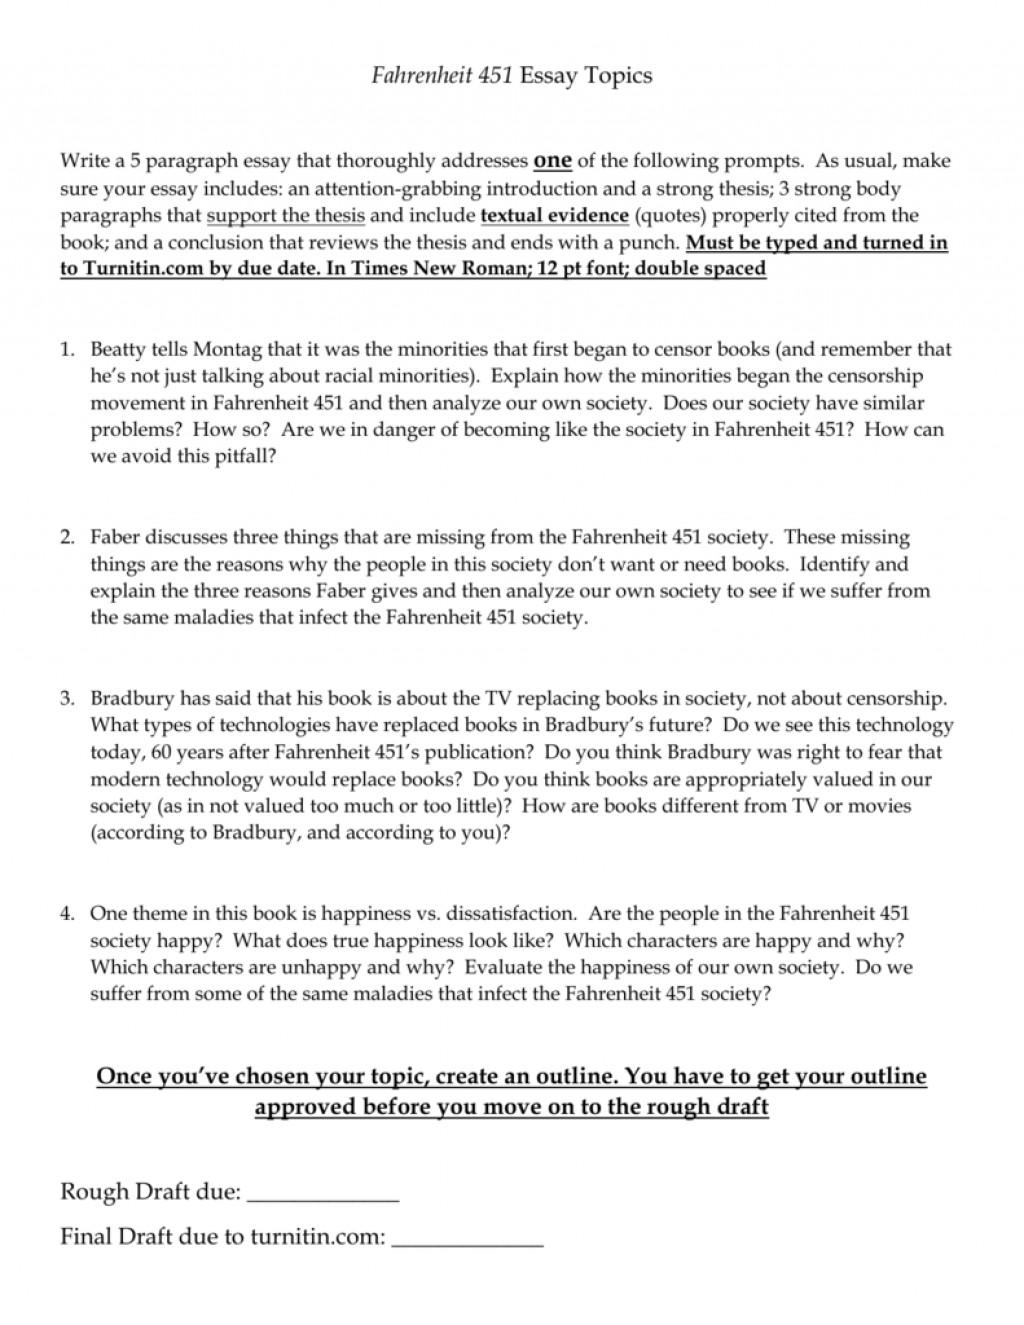 001 006753036 1 Fahrenheit Essay Best 451 Research Paper Topics Prompts Questions Pdf Large